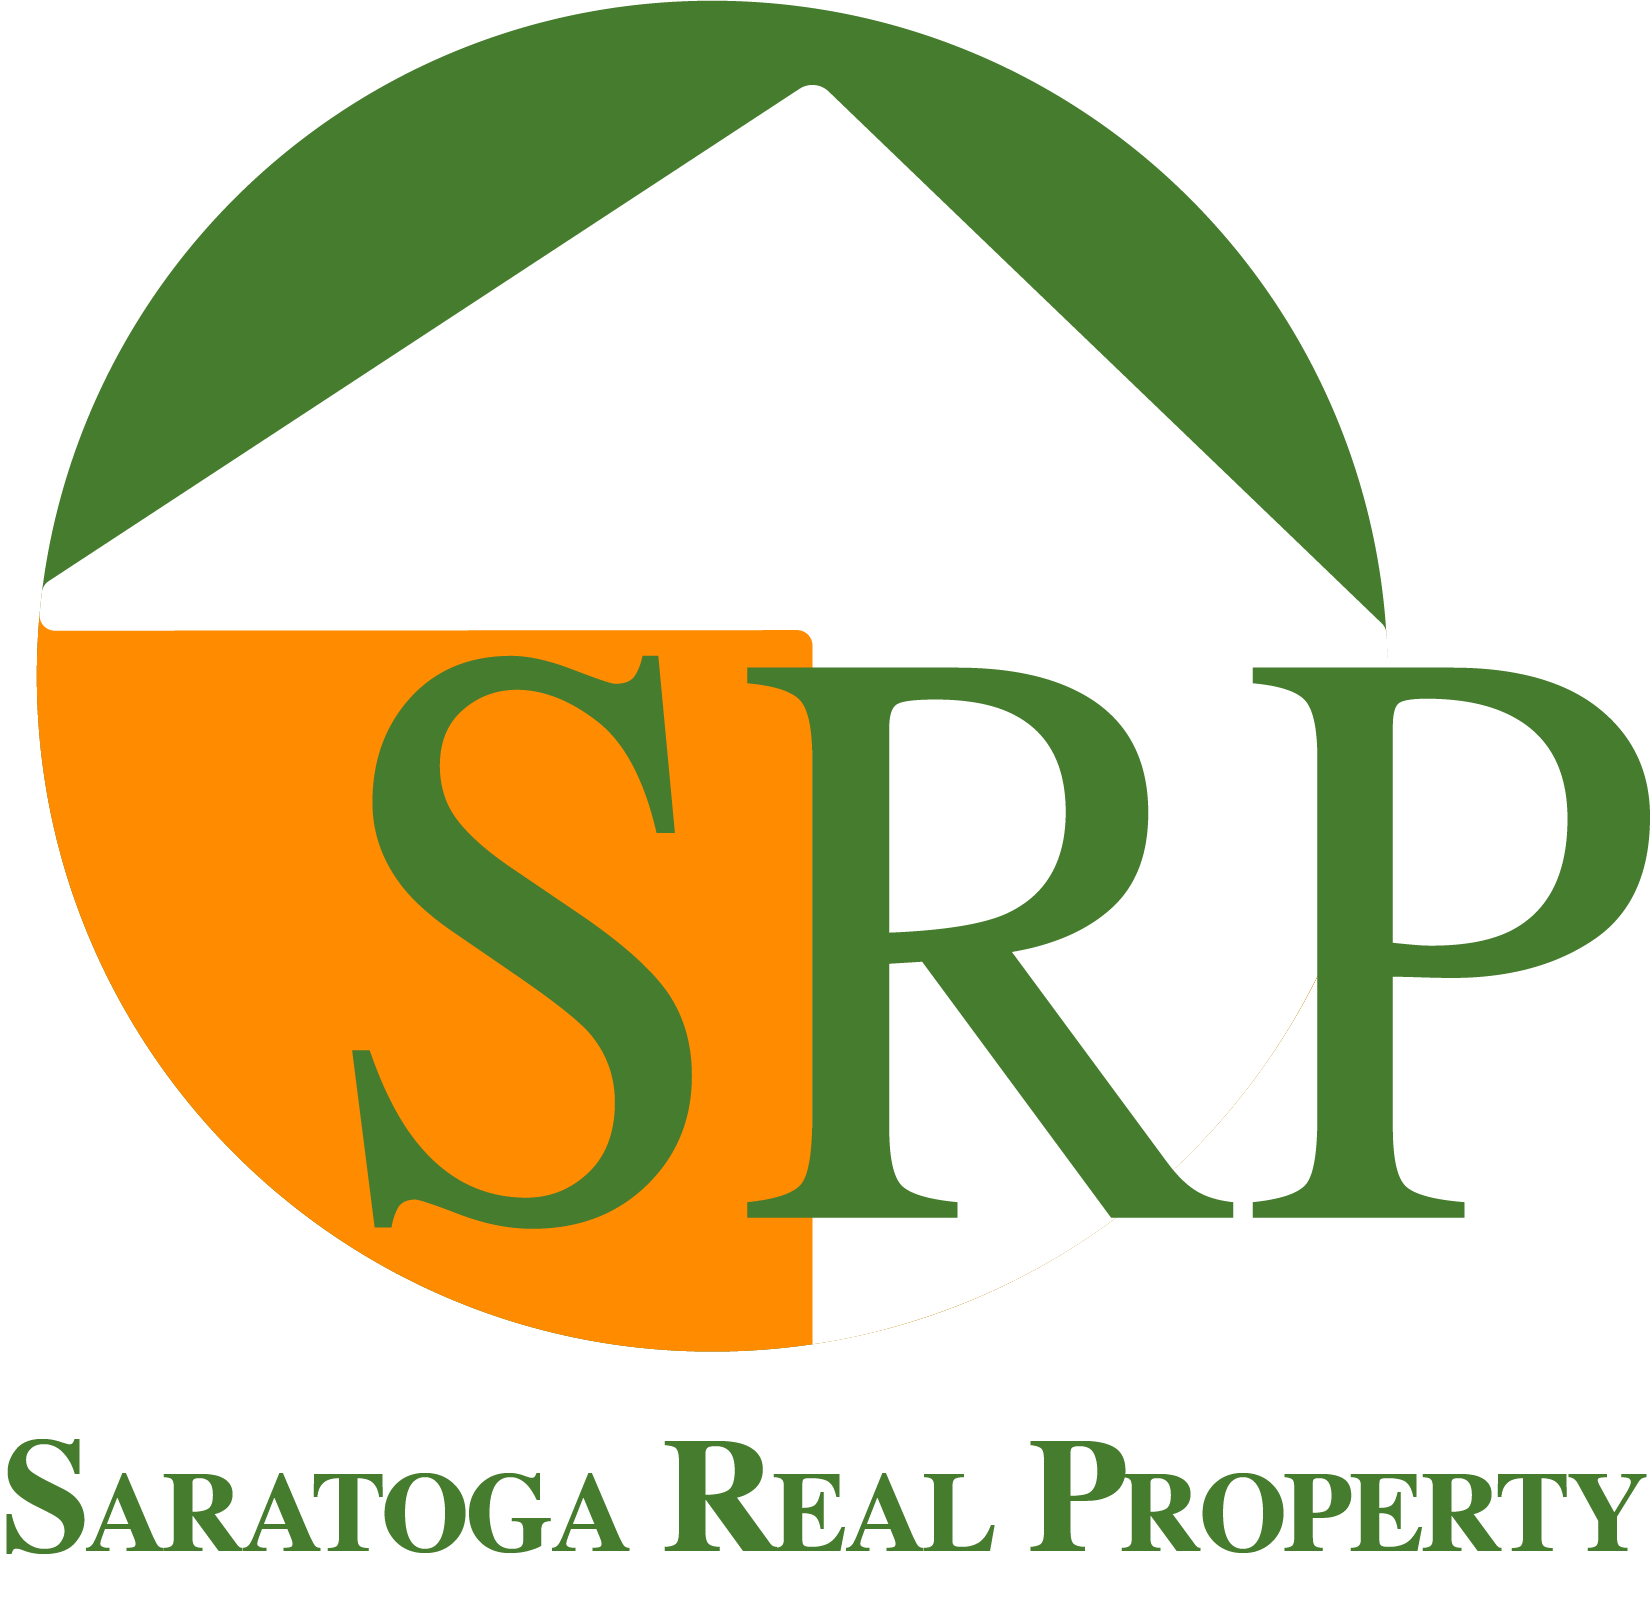 Saratoga Real Property